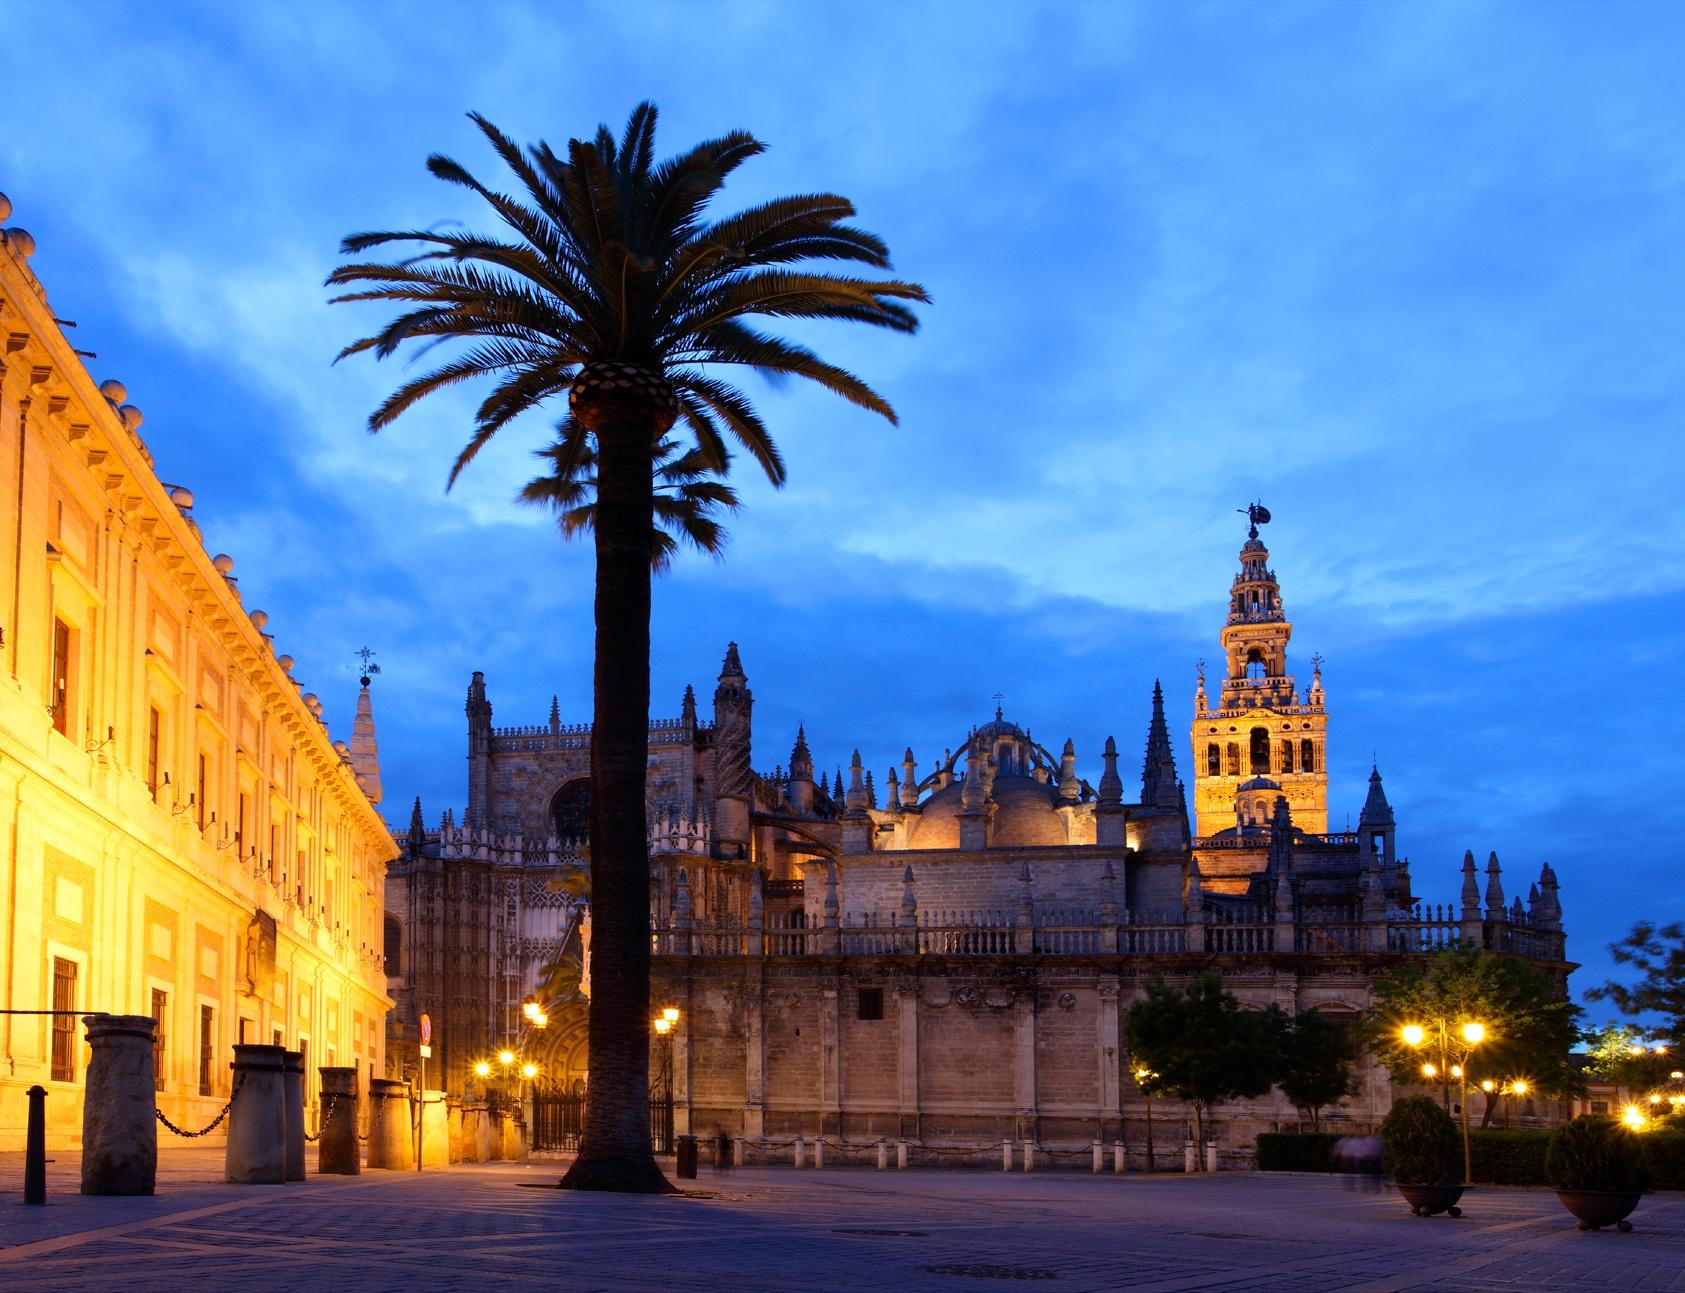 16EC_minisite_Cathedral-of-Seville.jpg